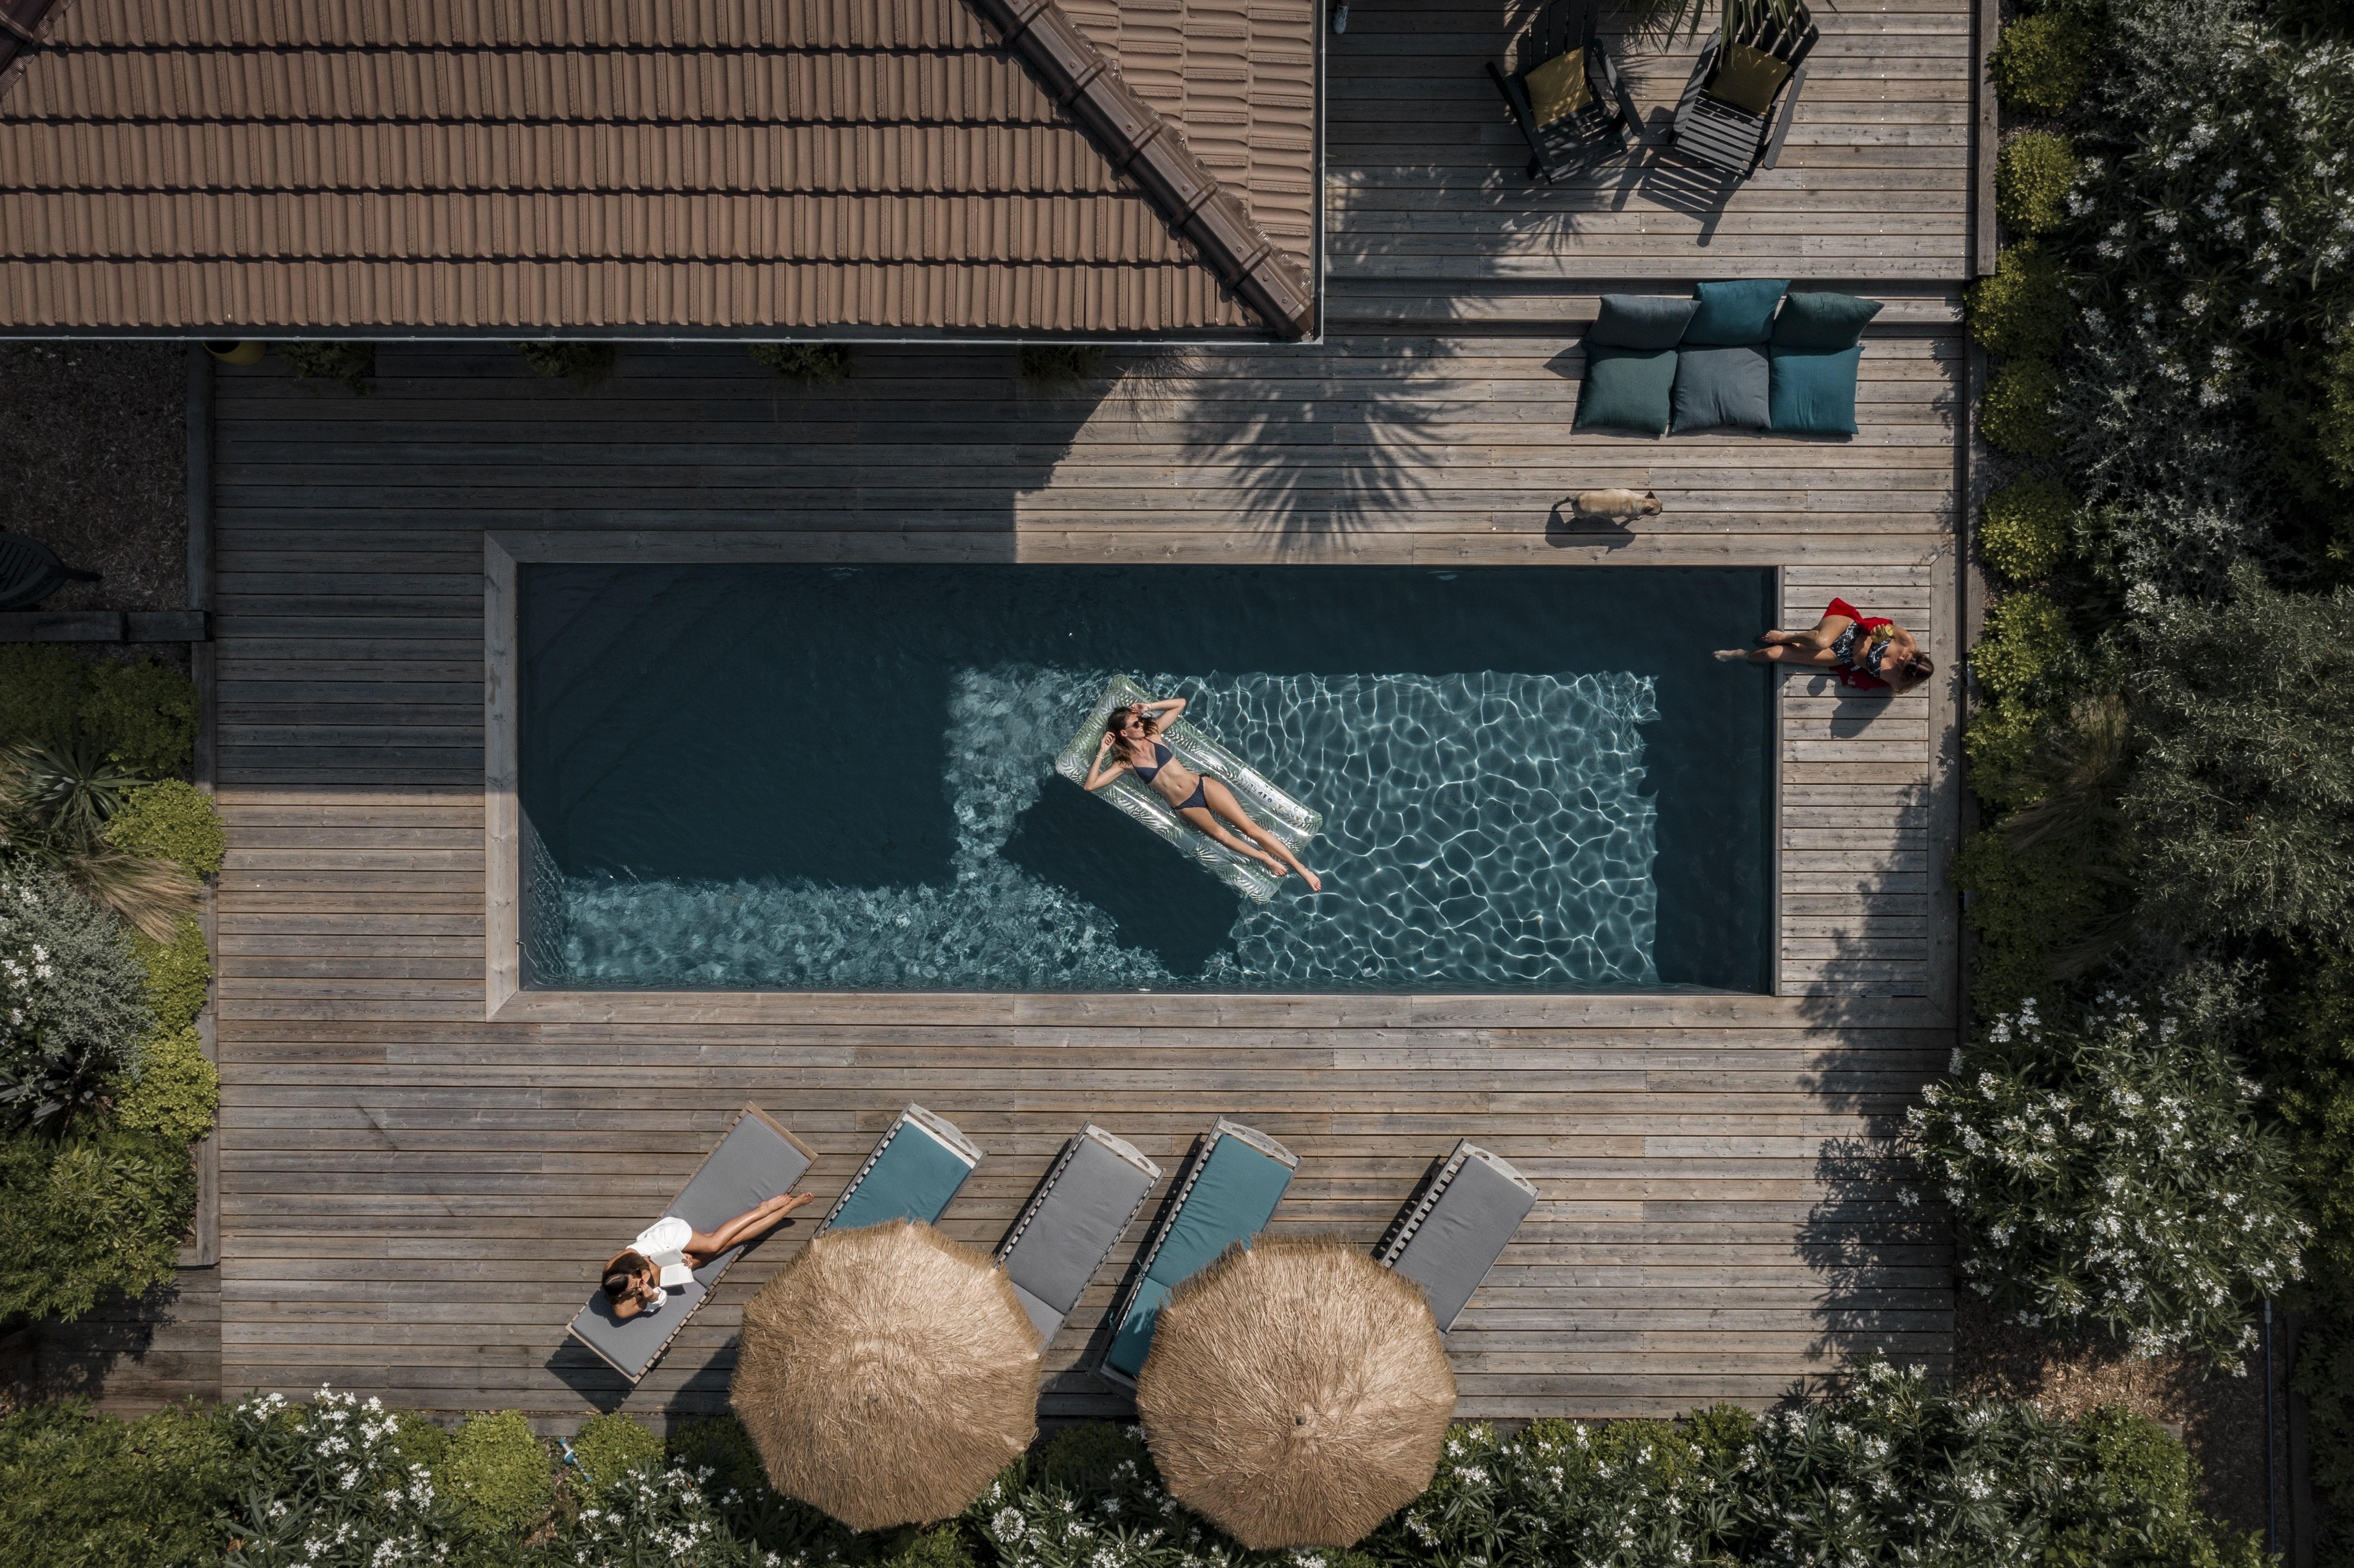 Constructeur De Piscine Paris piscines de france | linkedin